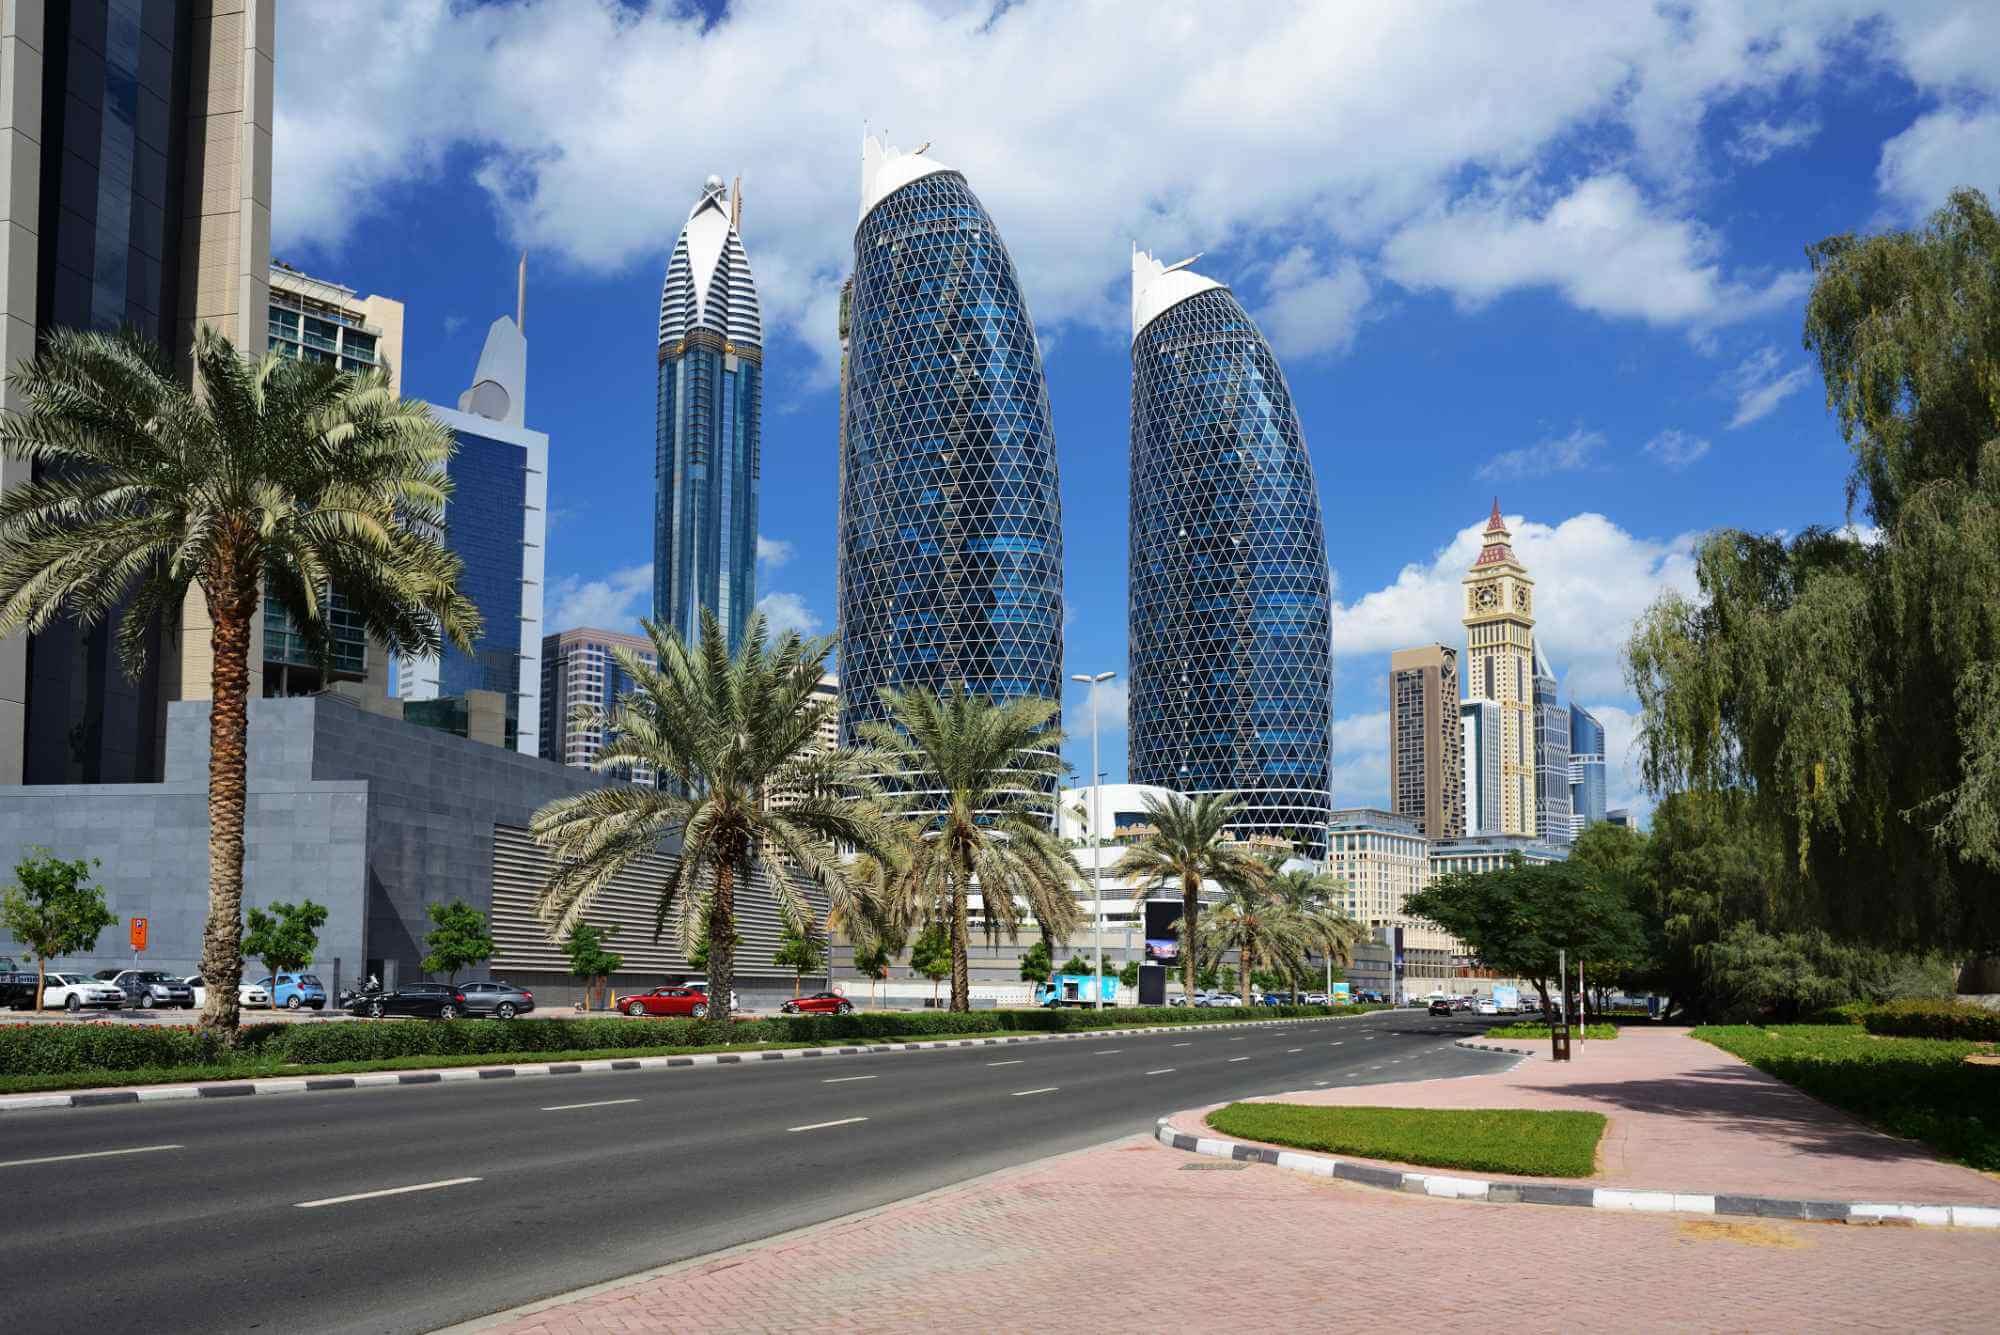 Meet KPM Analytics at IAOM Mideast & Africa 2021, Dubai.